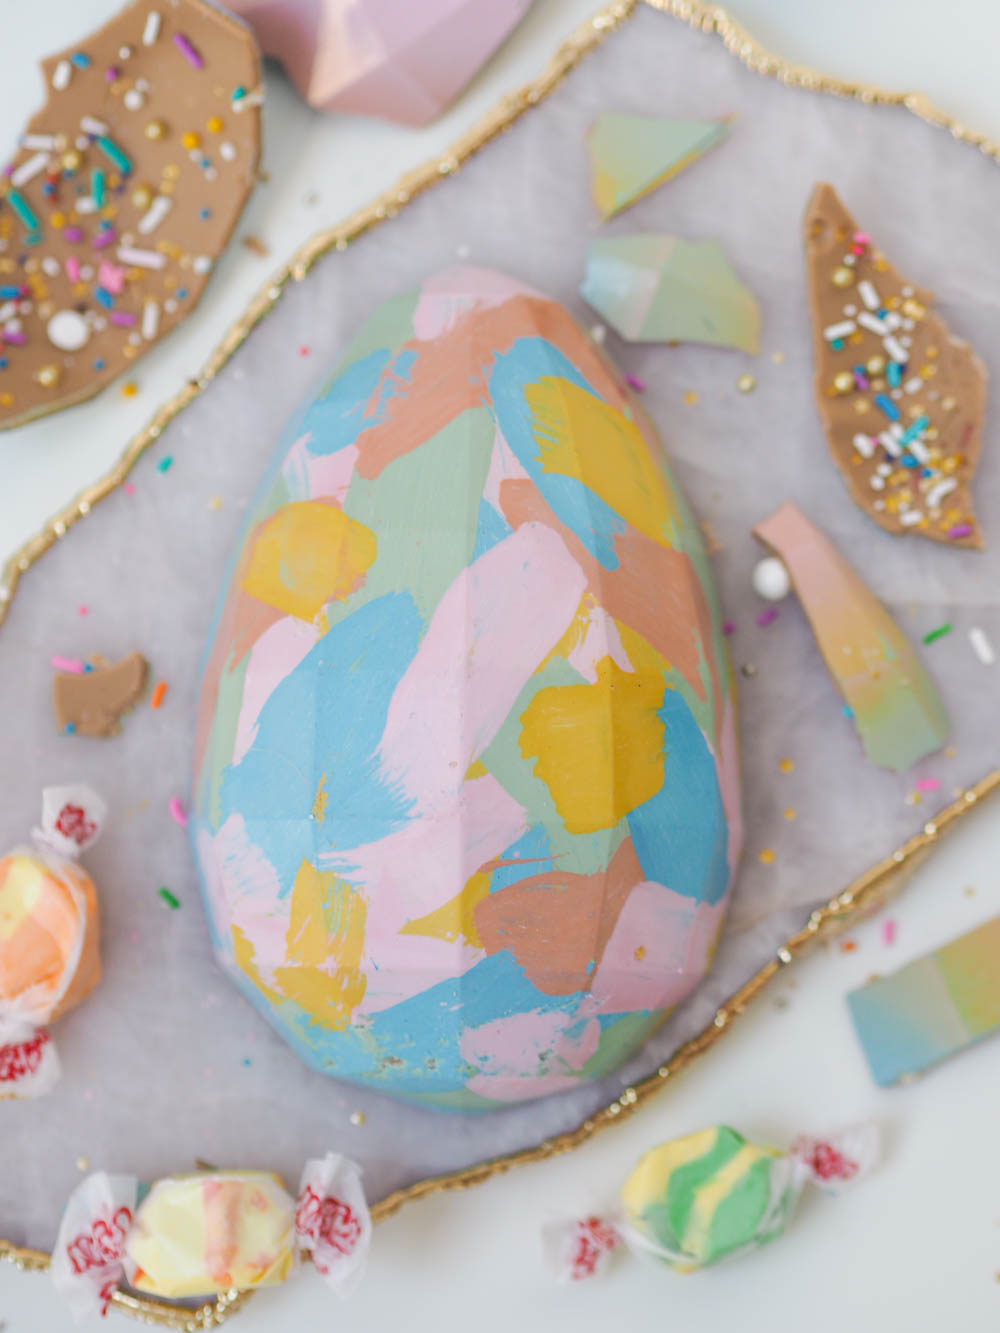 CXBO x Tiffany Pratt Disco Egg